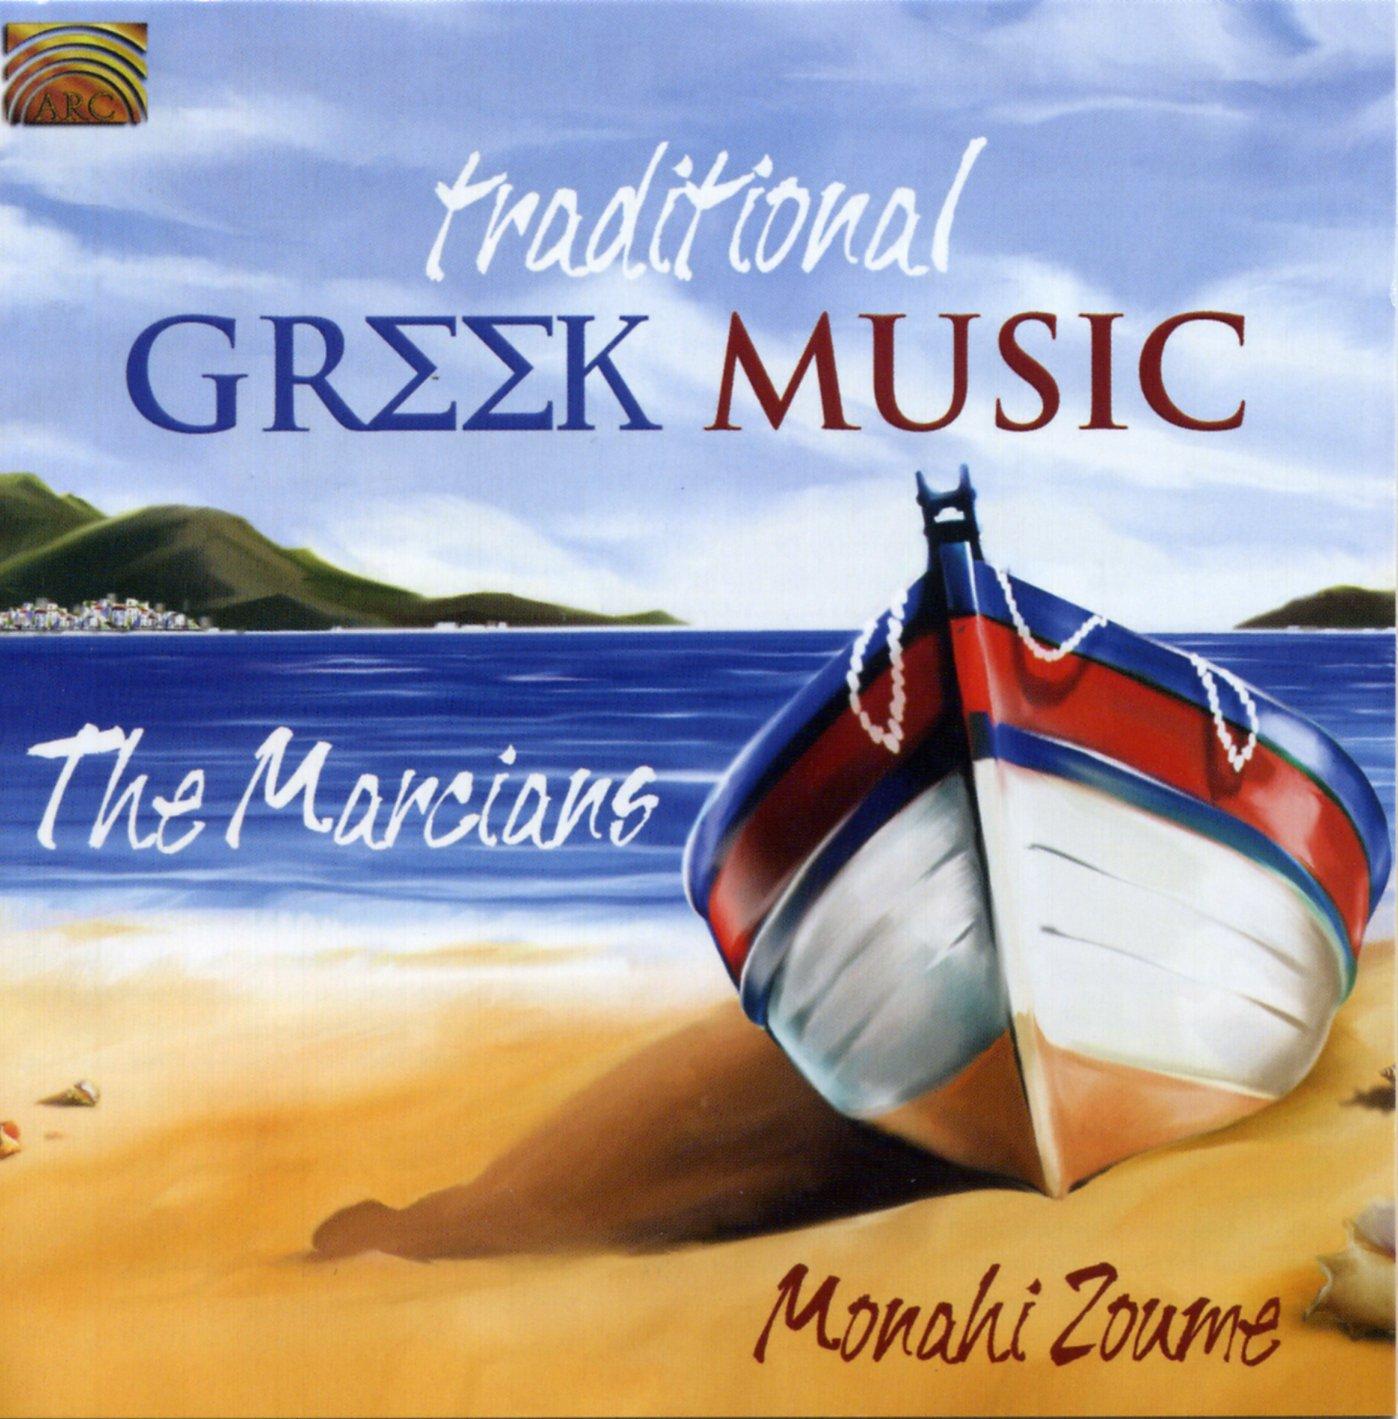 Traditional Greek Music: Bargain Fresno Mall Zoume Monahi